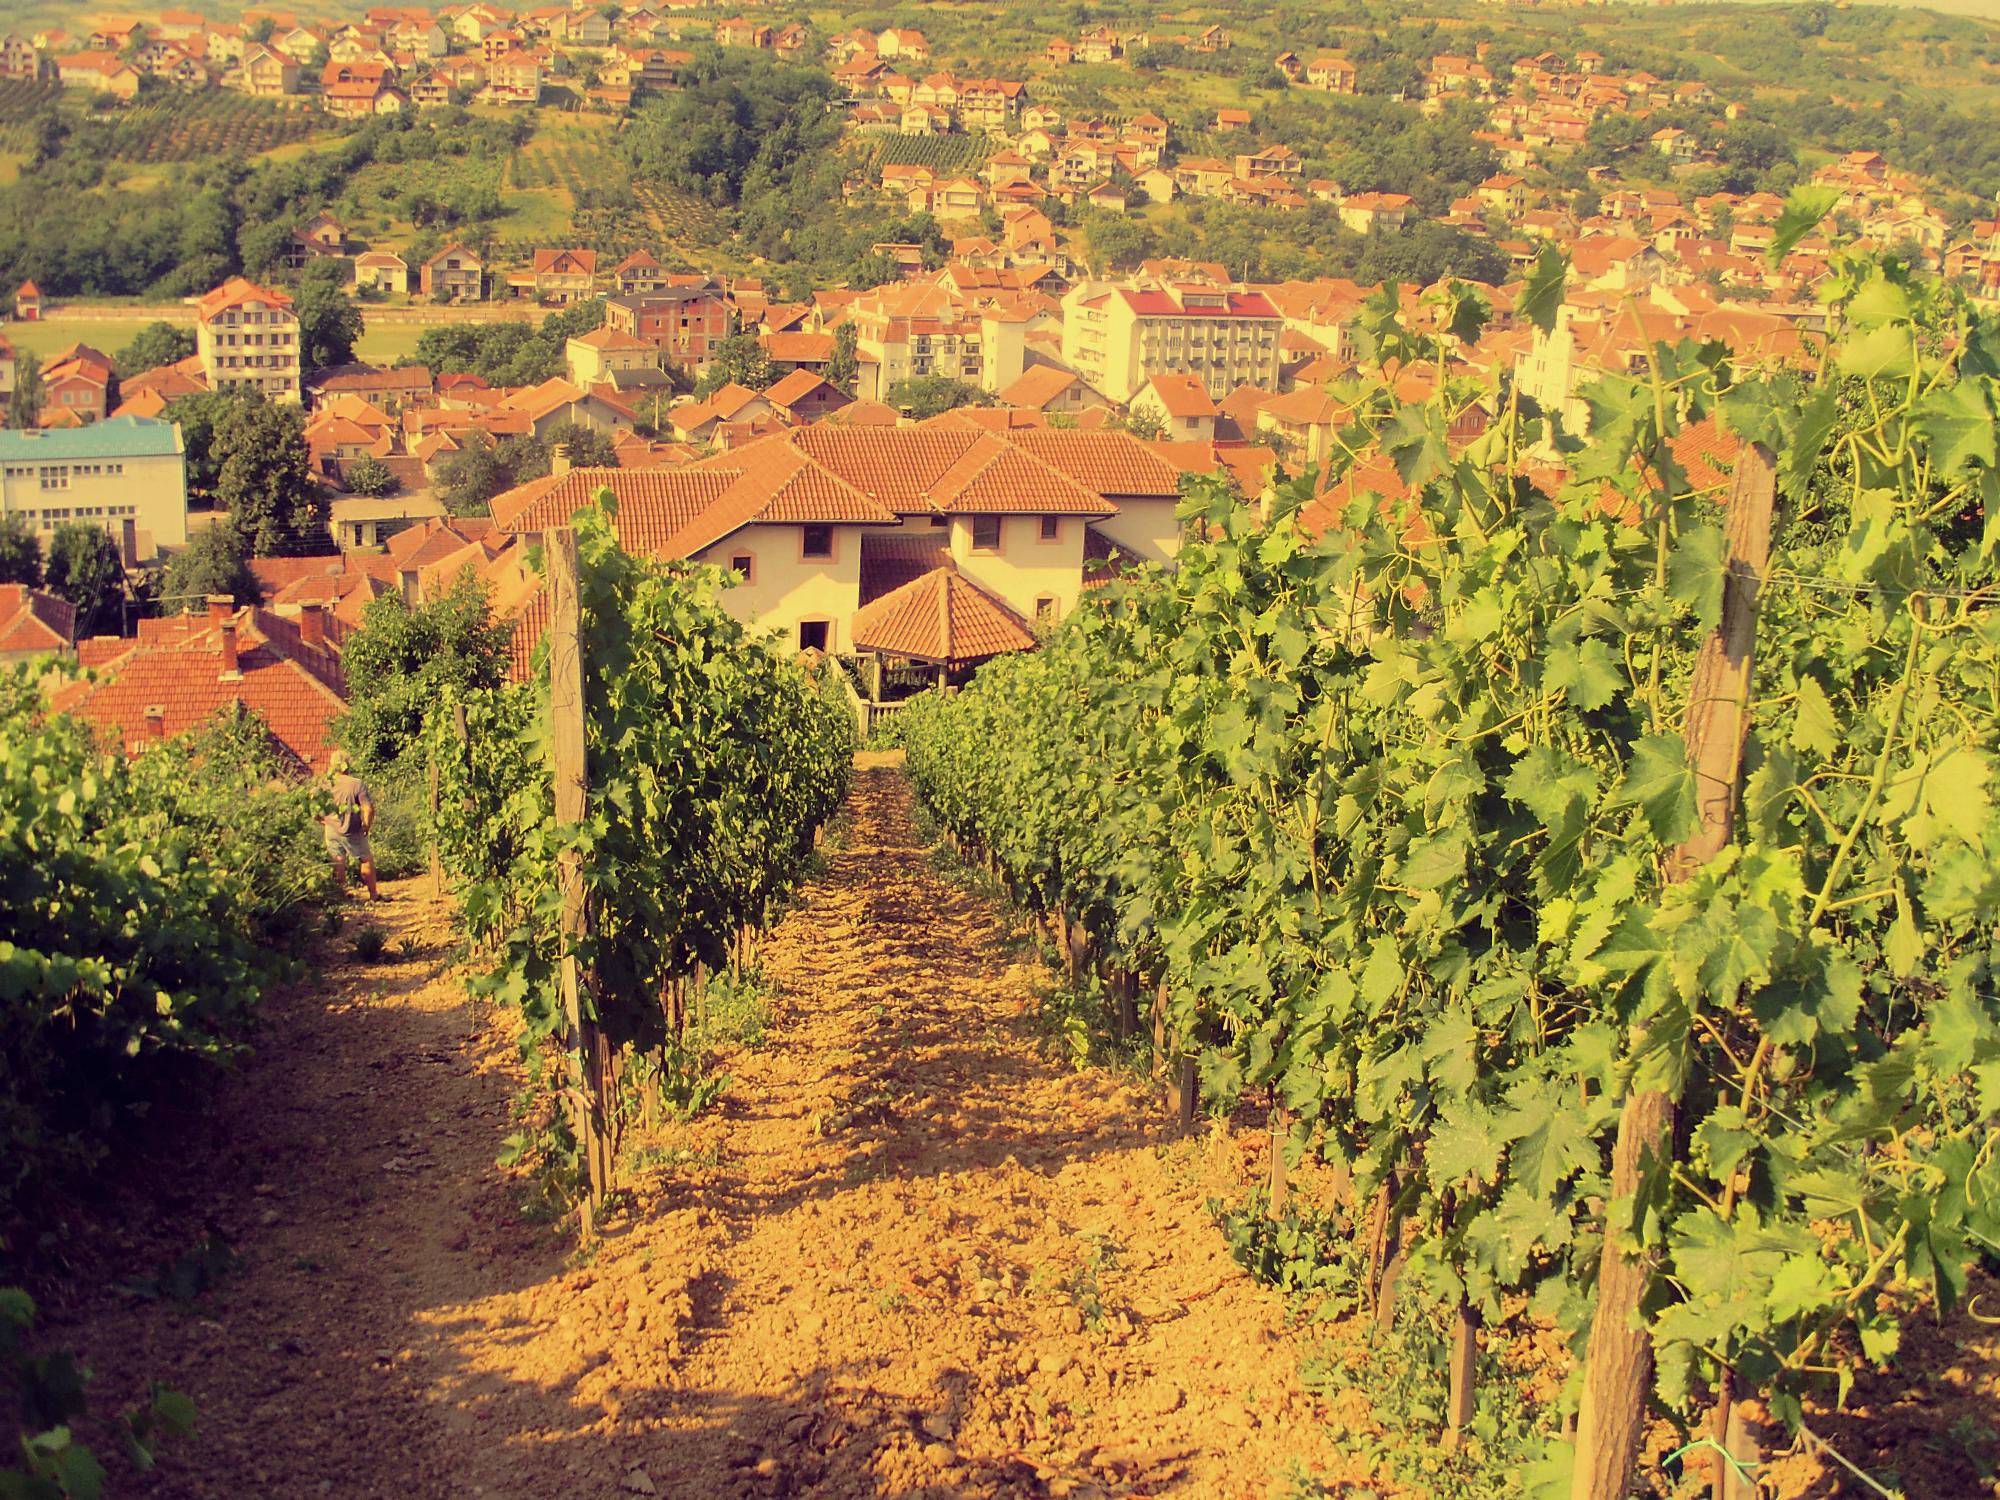 Weingarten Weingut Ivanovic